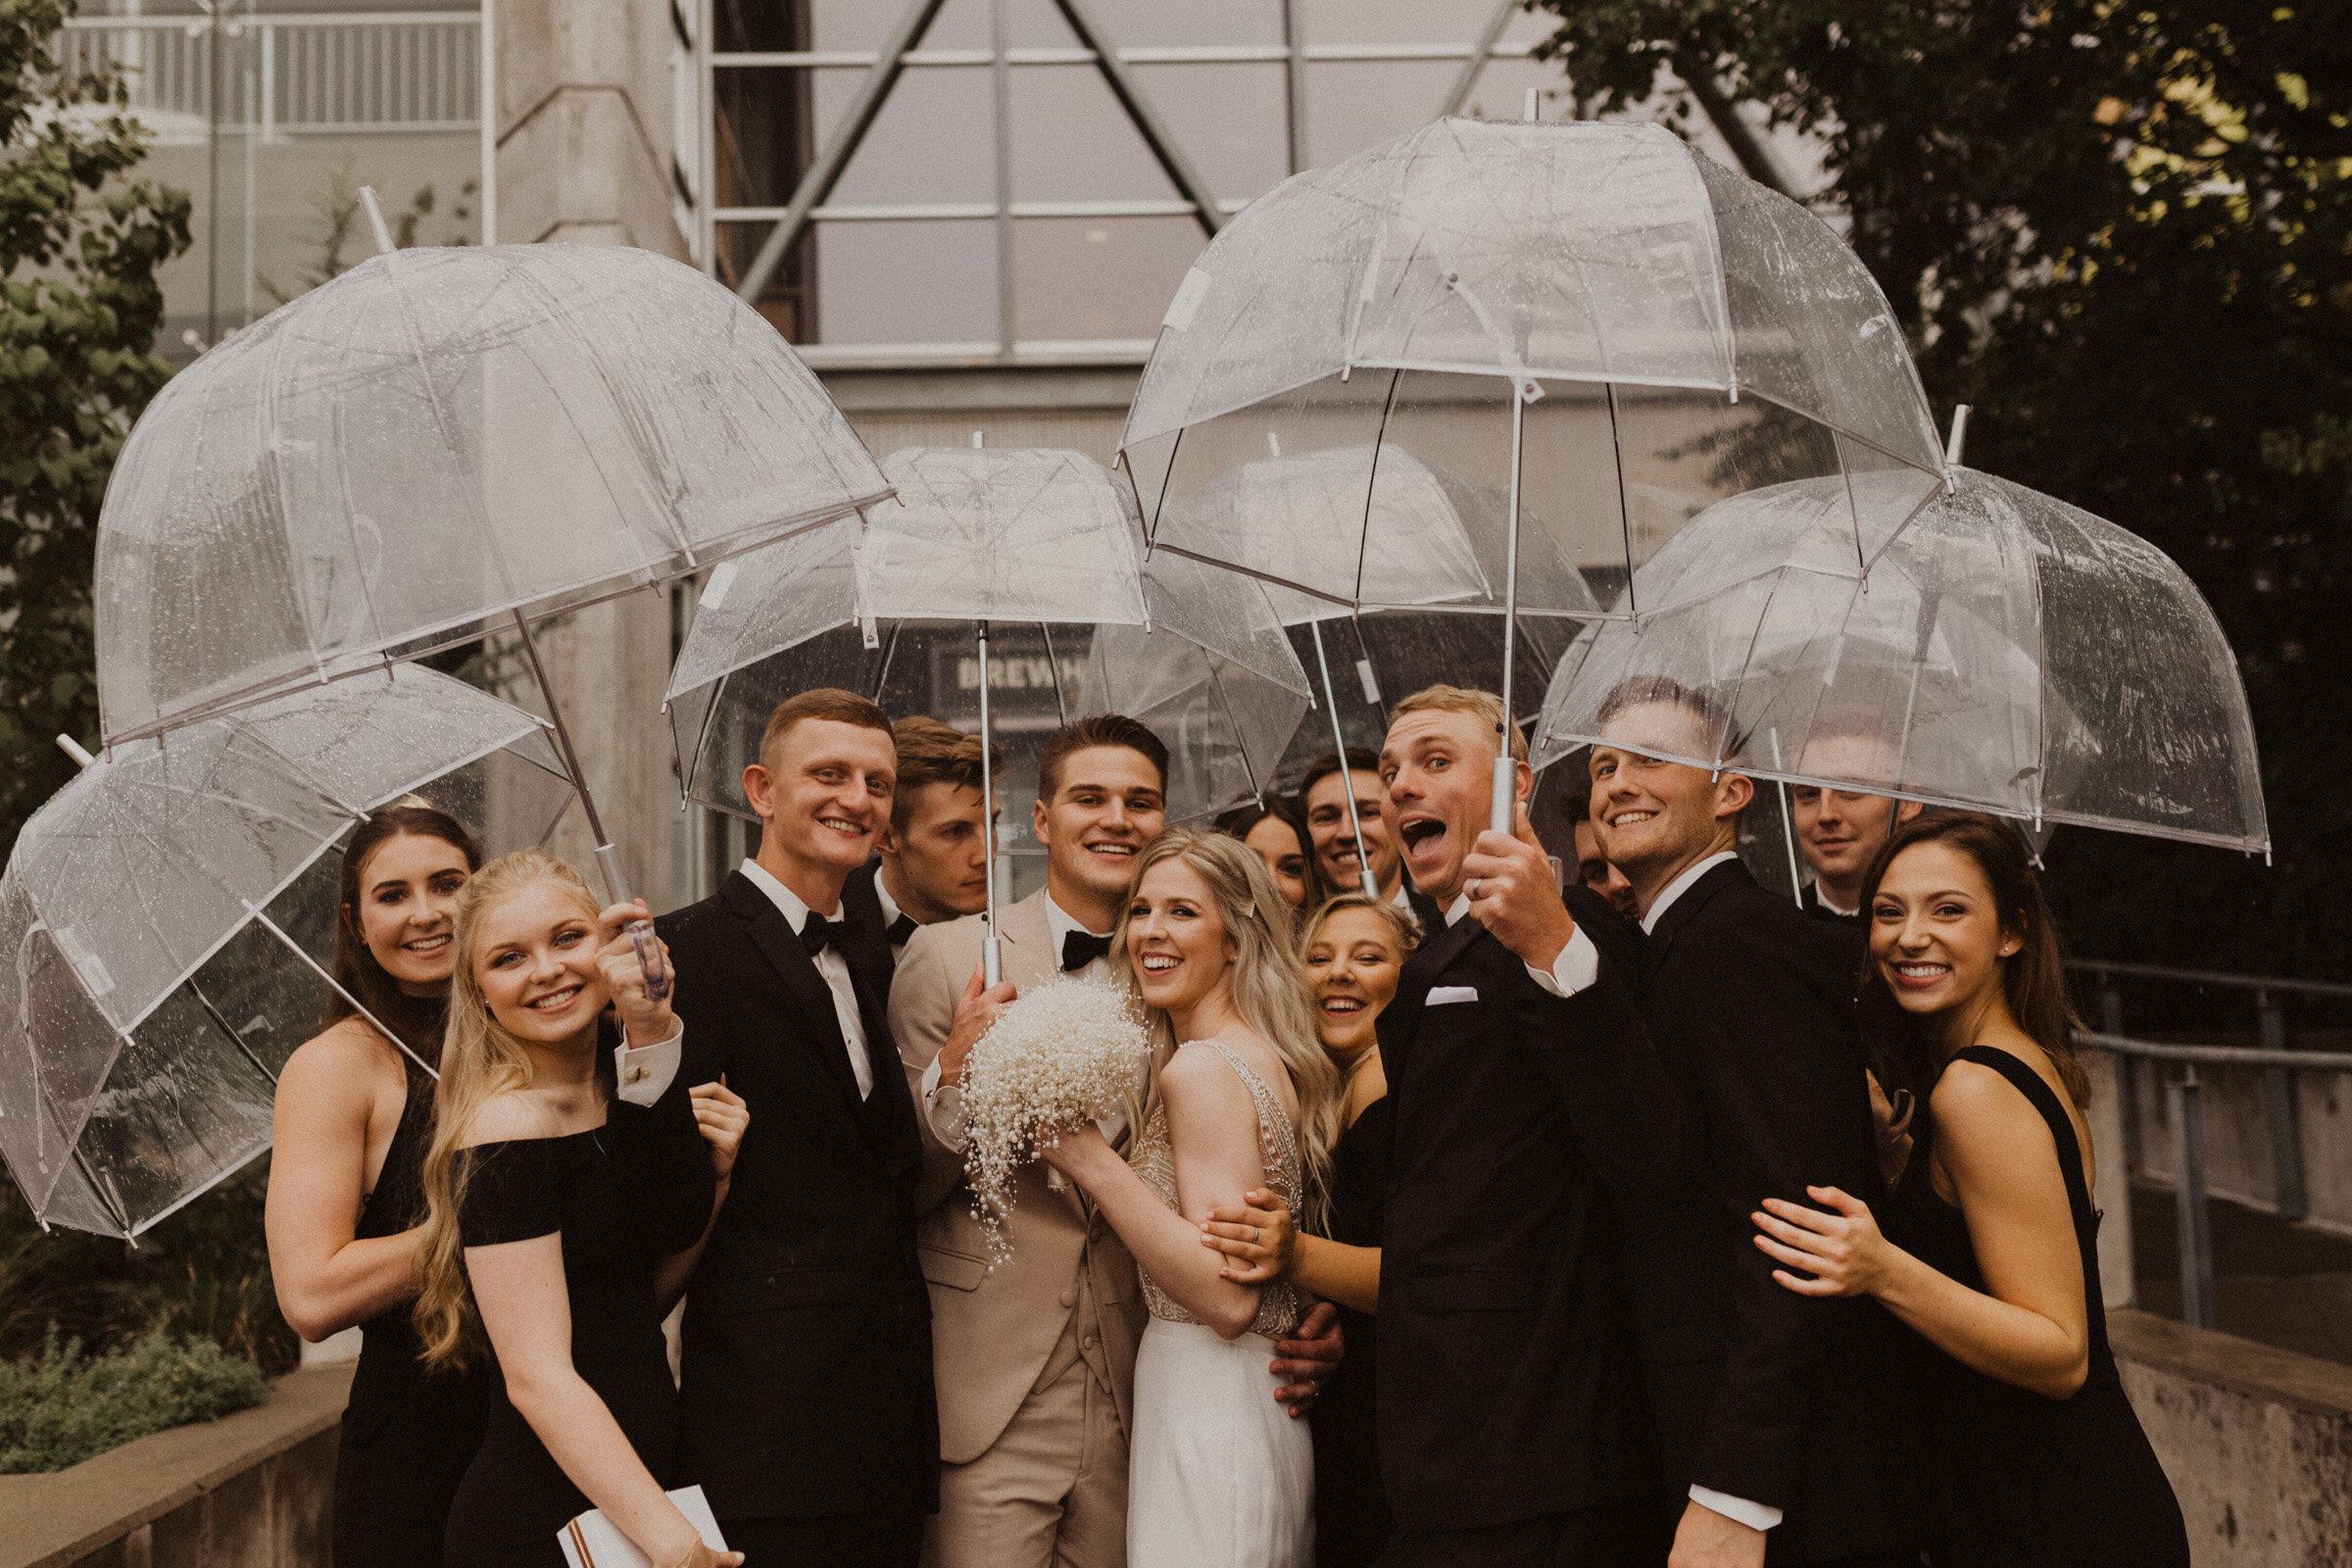 alyssa barletter photography downtown kansas city wedding boulevard brewery reception rainy day wedding-45.jpg